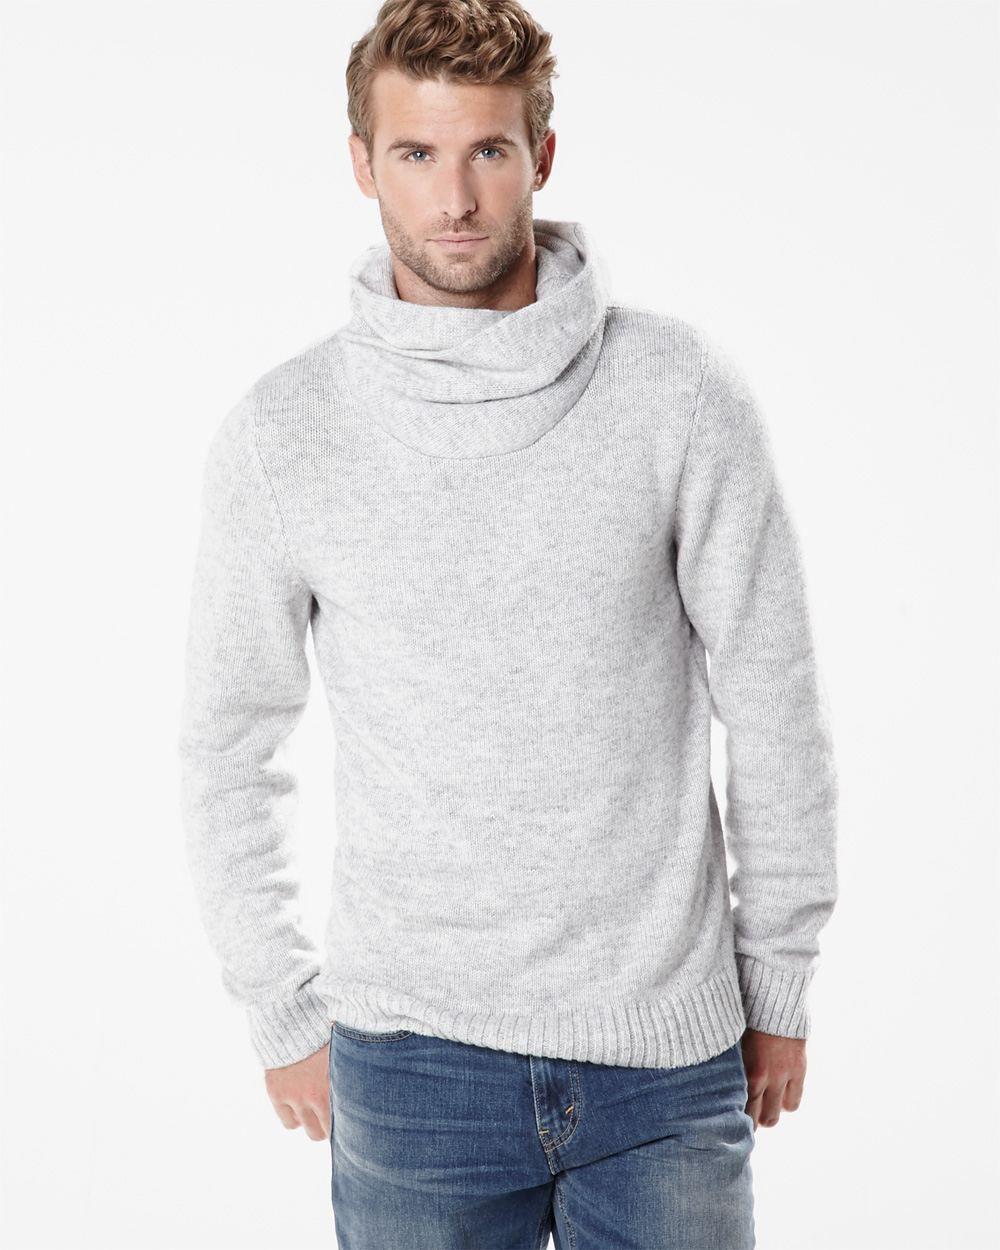 4dd8b3f145a7 Snood collar sweater